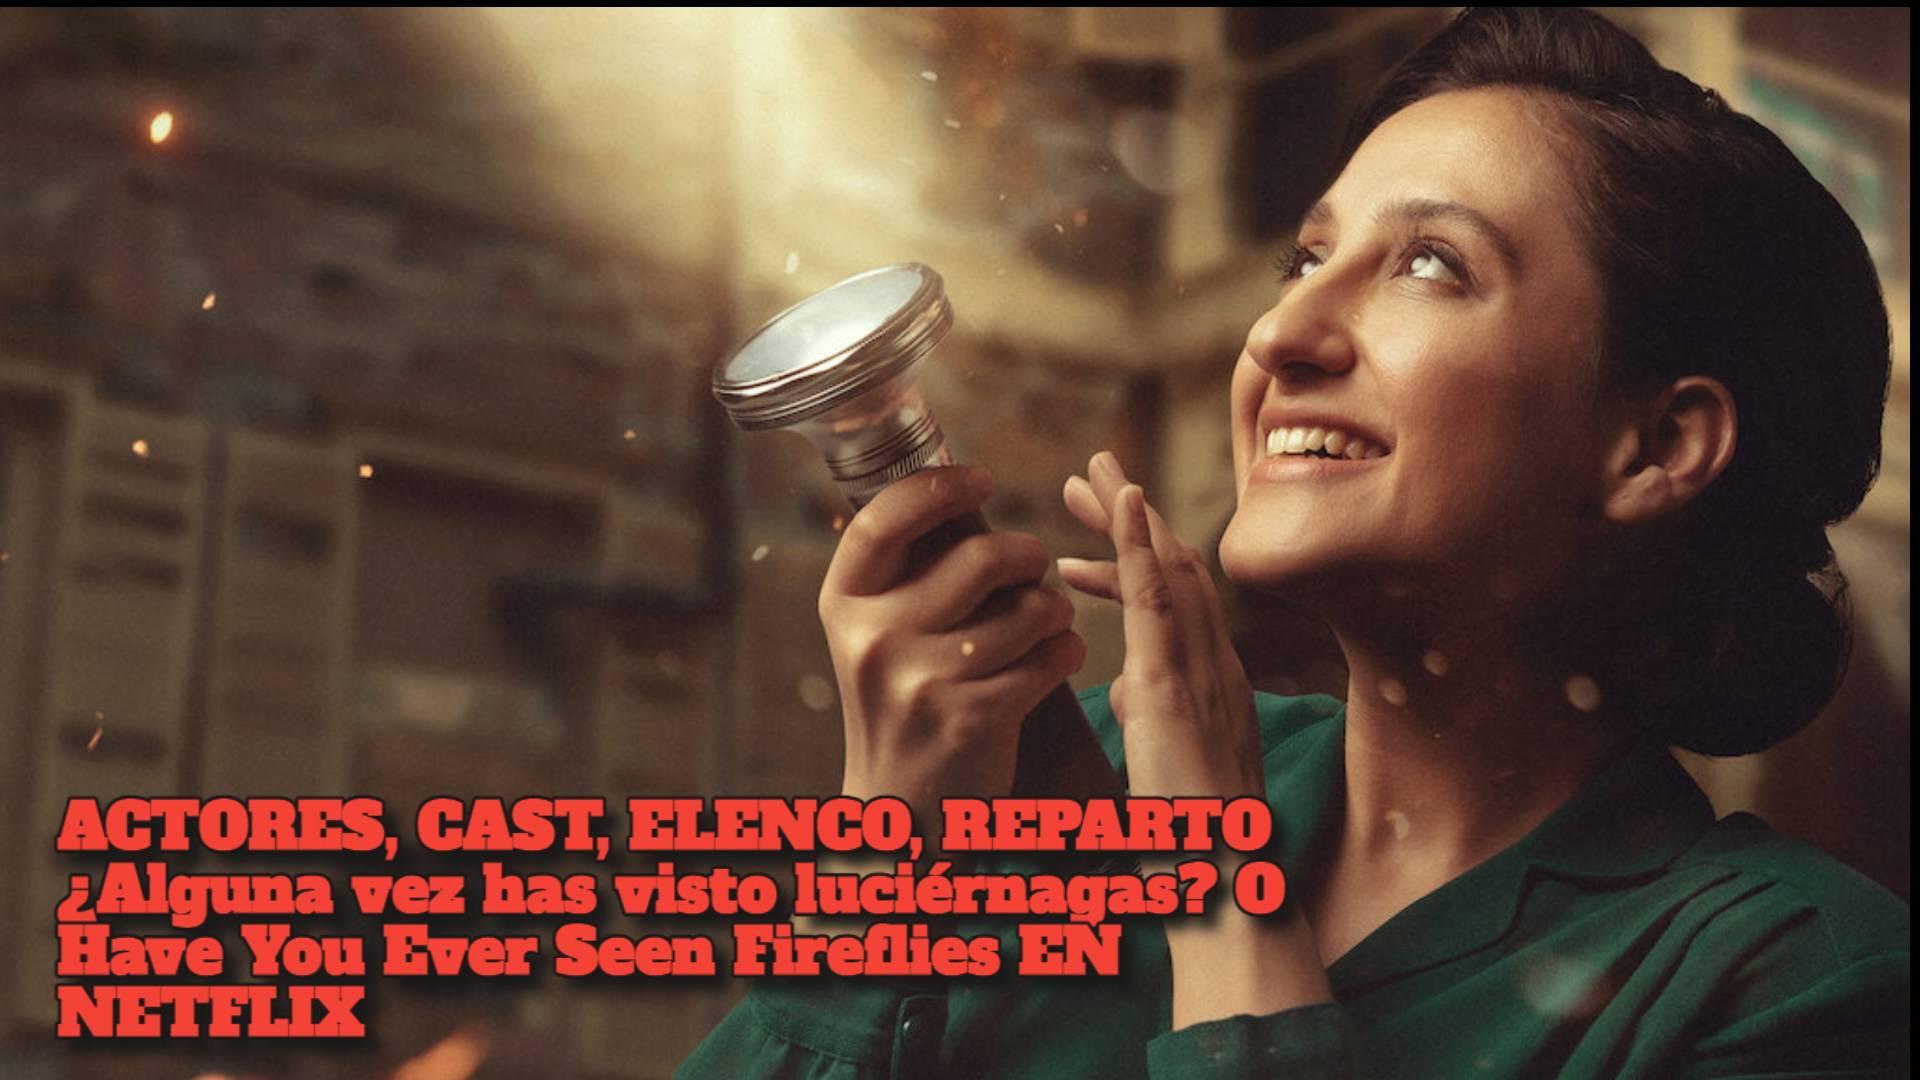 ACTORES, CAST, ELENCO, REPARTO ¿Alguna vez has visto luciérnagas? O Have You Ever Seen Fireflies EN NETFLIX